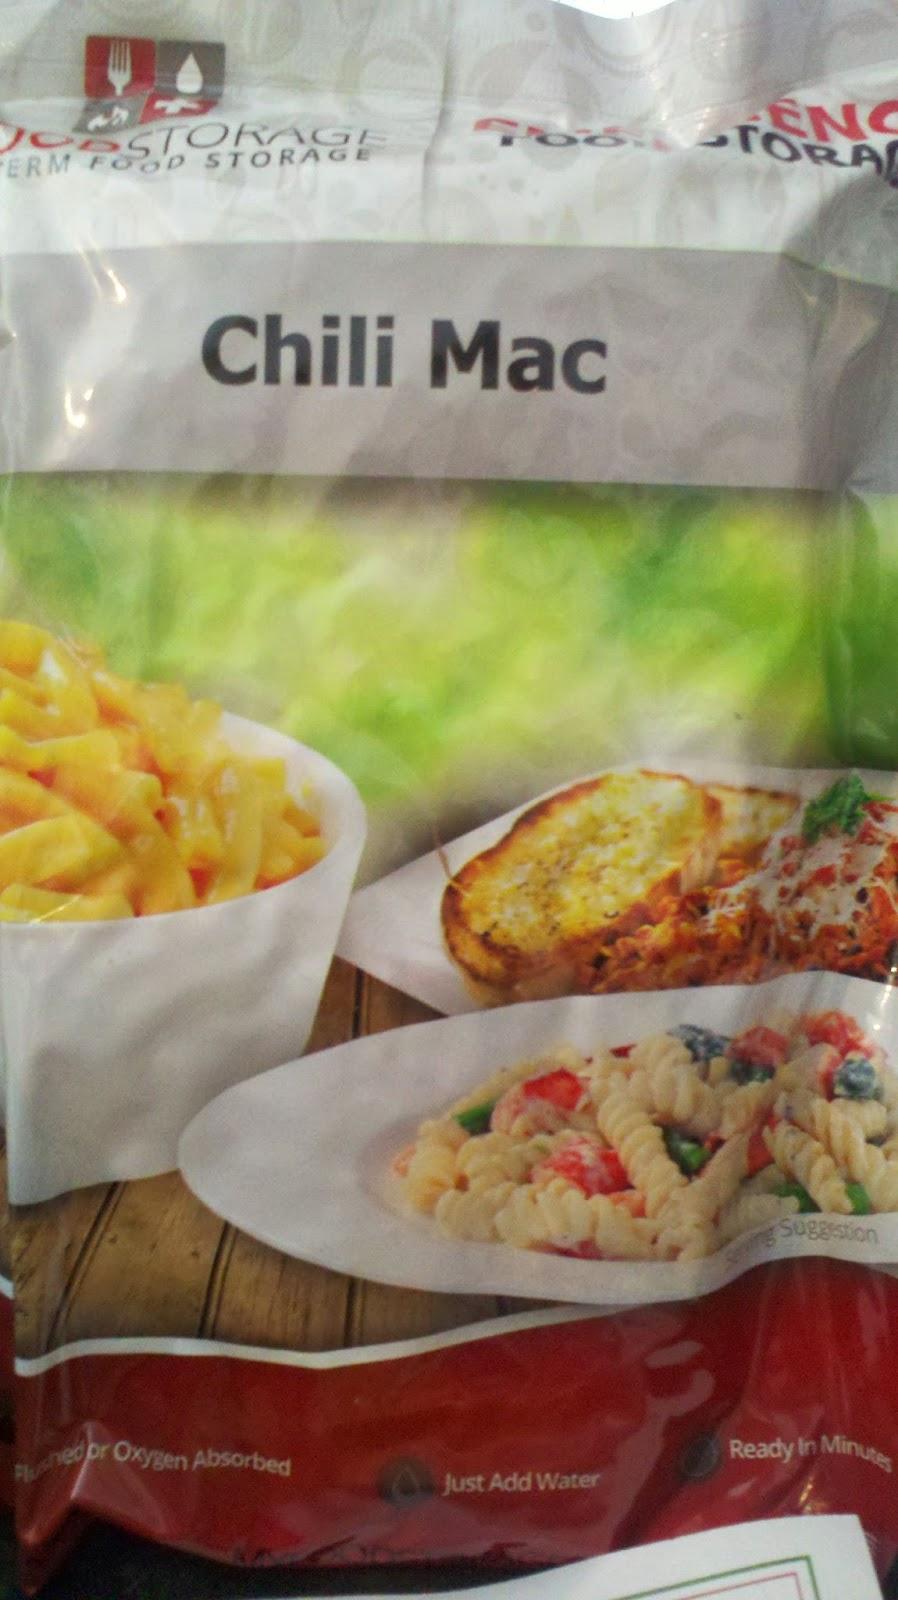 My food storage, MRE, dehydrated foods, MRE chili mac